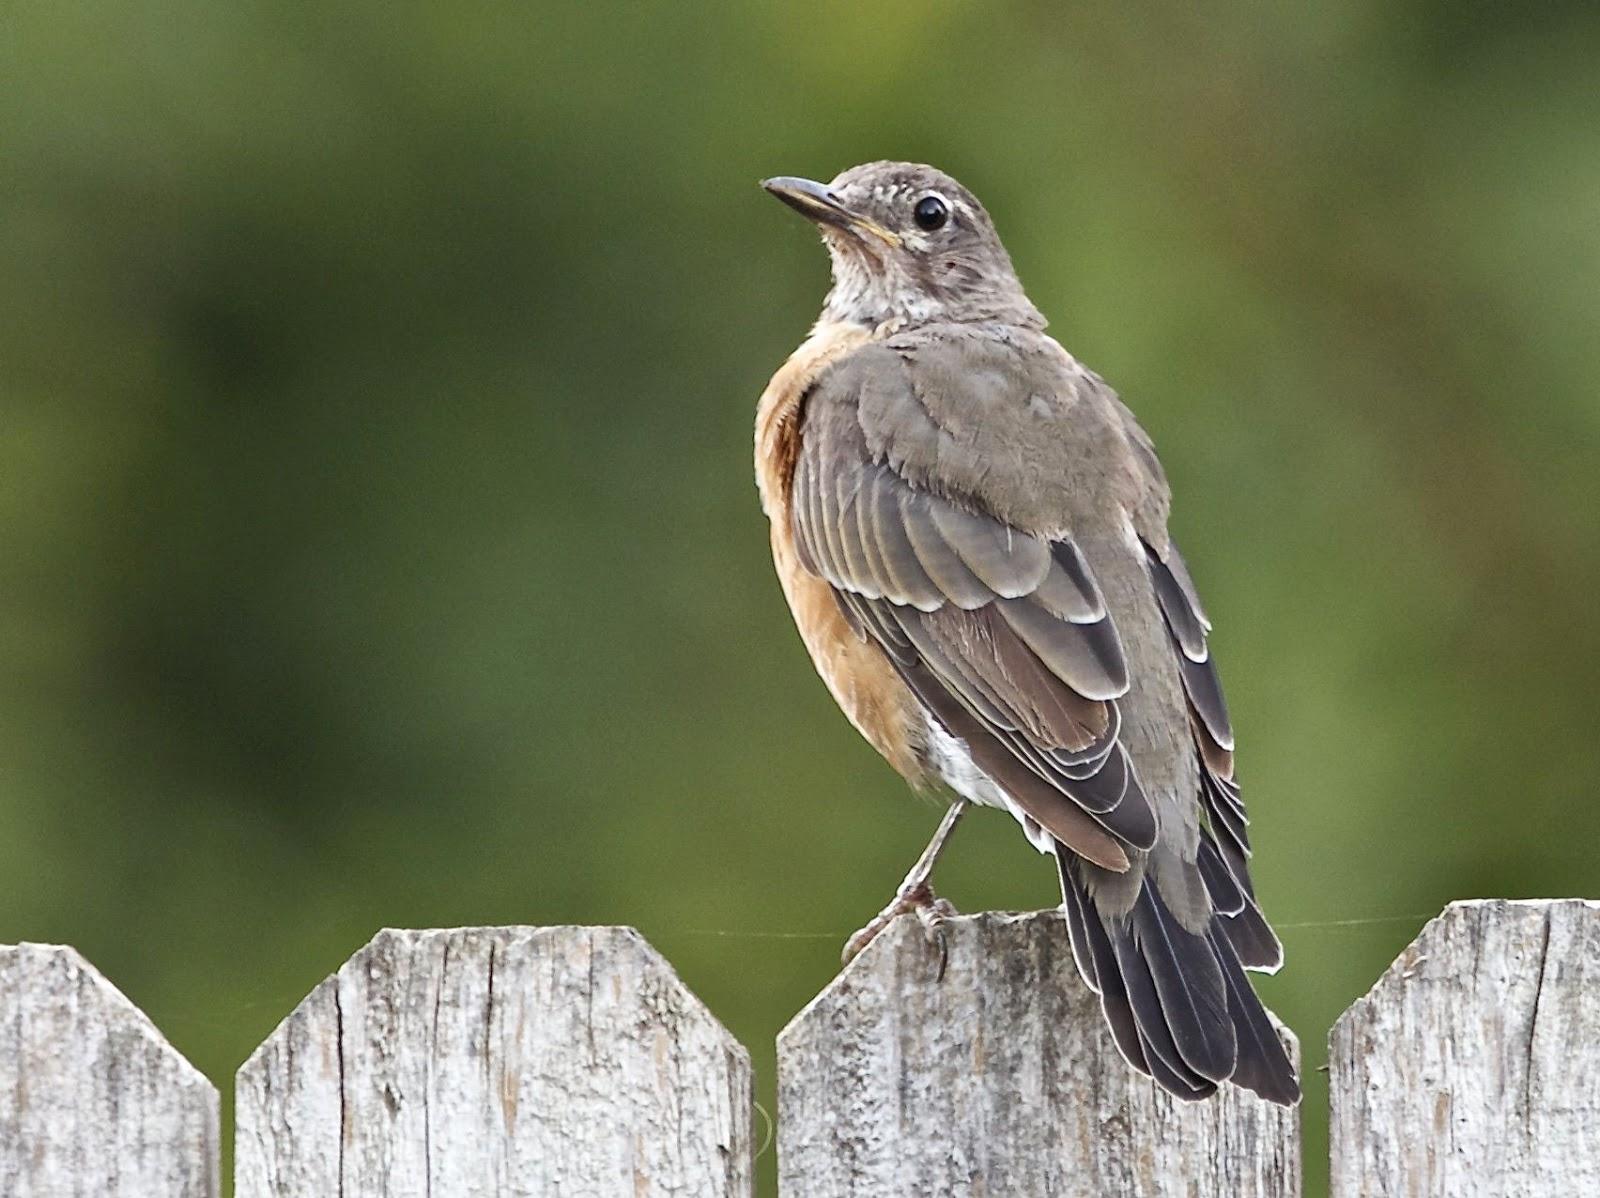 Avithera: Some northern California birds